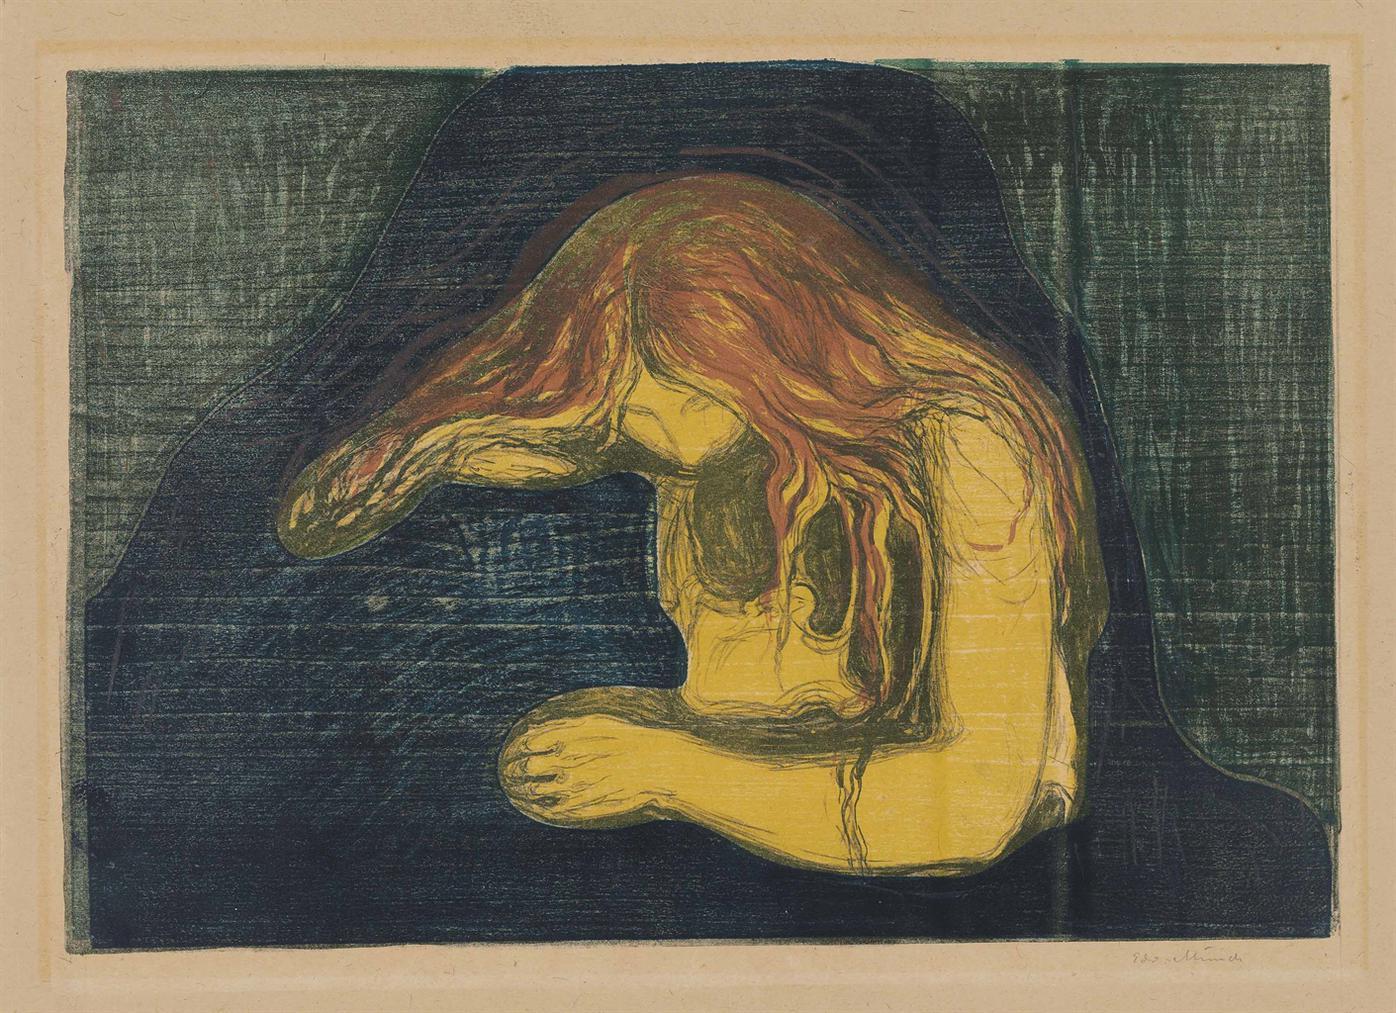 Edvard Munch-Vampire II-1902